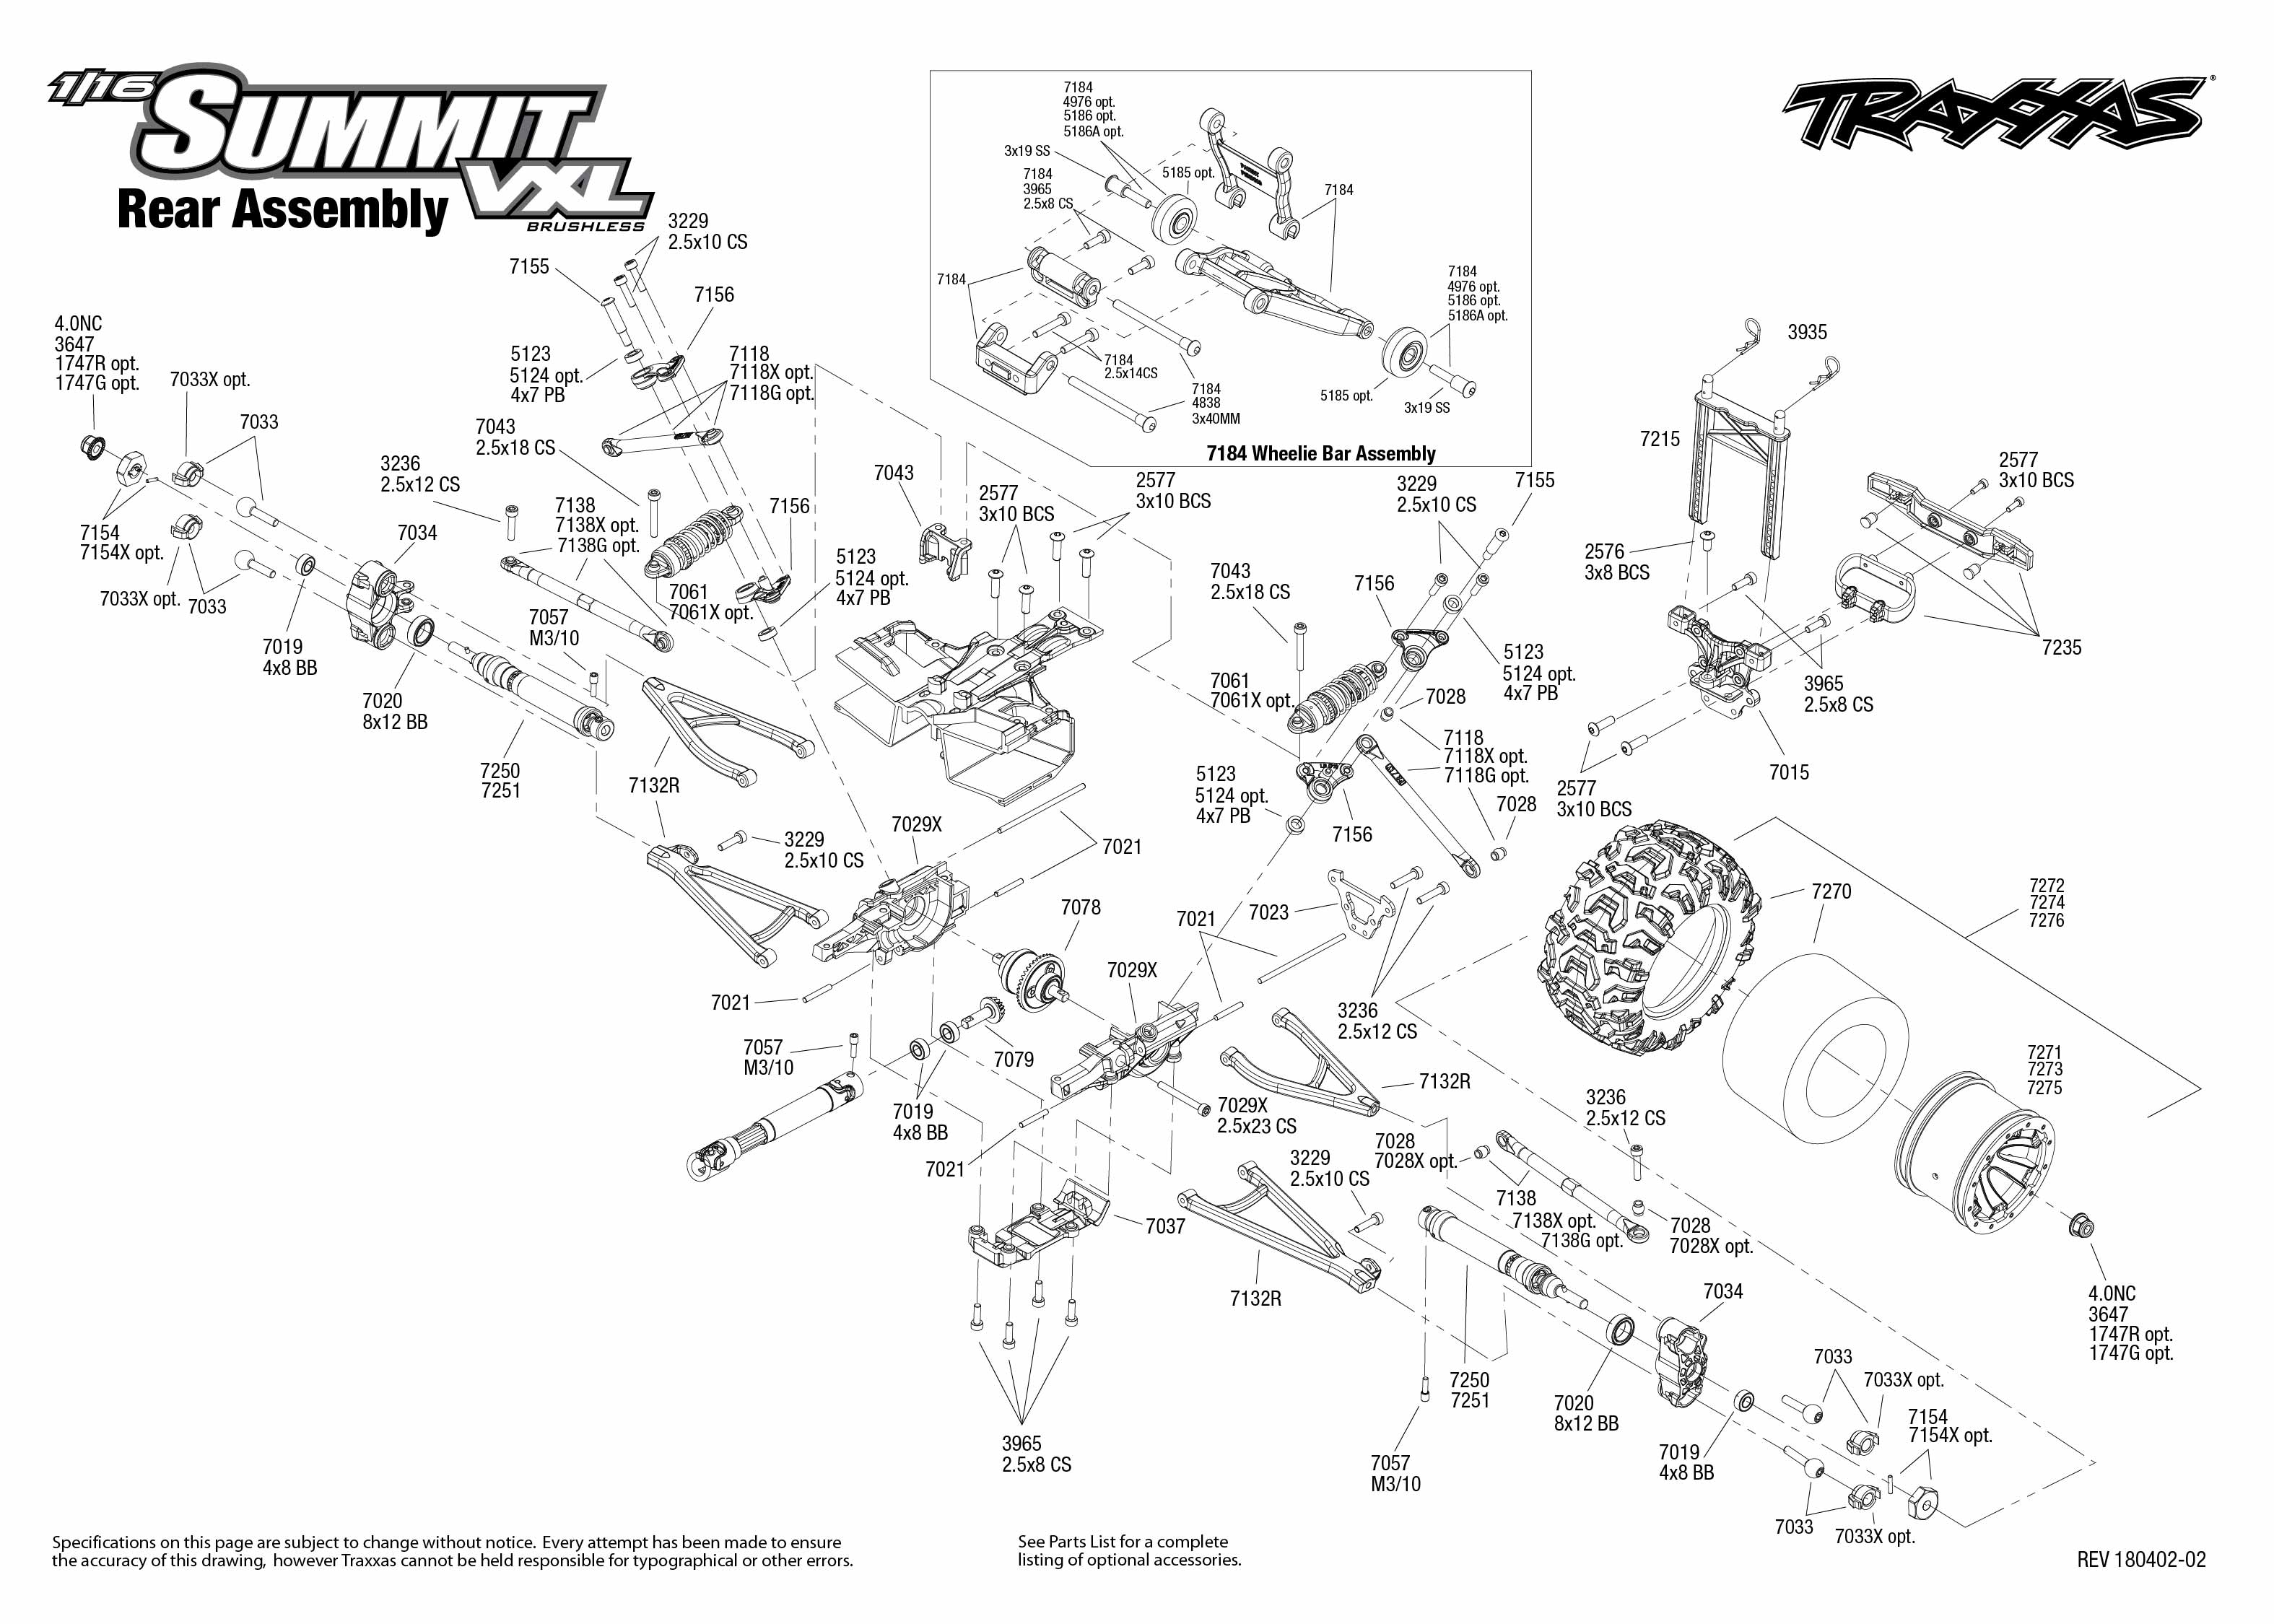 Traxxas 72076-3 Summit 1/16 VXL TSM Express-Suche aus